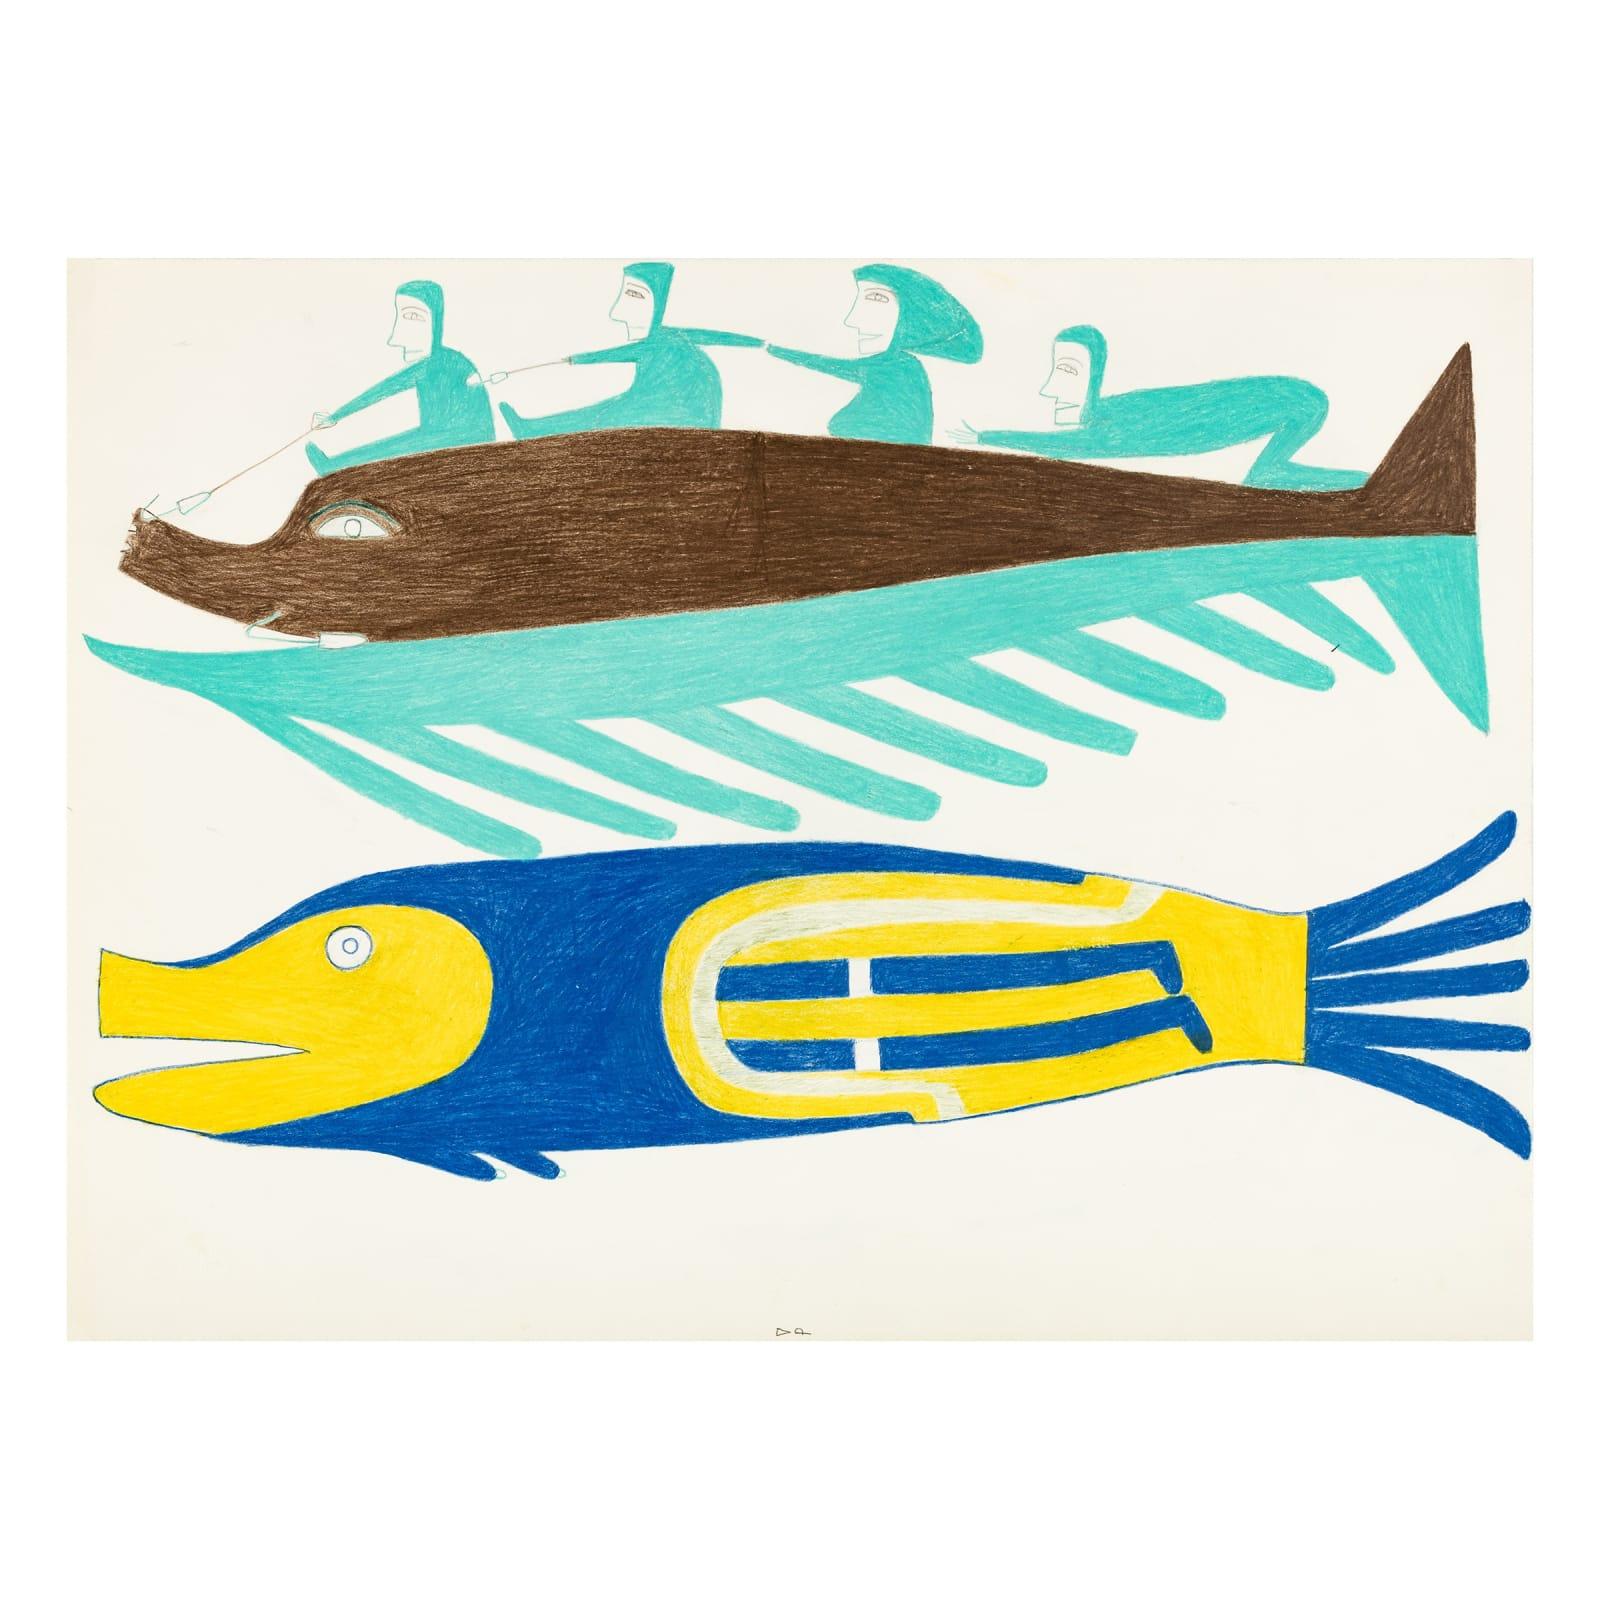 JESSIE OONARK, O.C., R.C.A (1906-1985) QAMANI'TUAQ (BAKER LAKE) Untitled (Fish Riders and Fish-Woman), c. 1978 REALIZED: $7,800